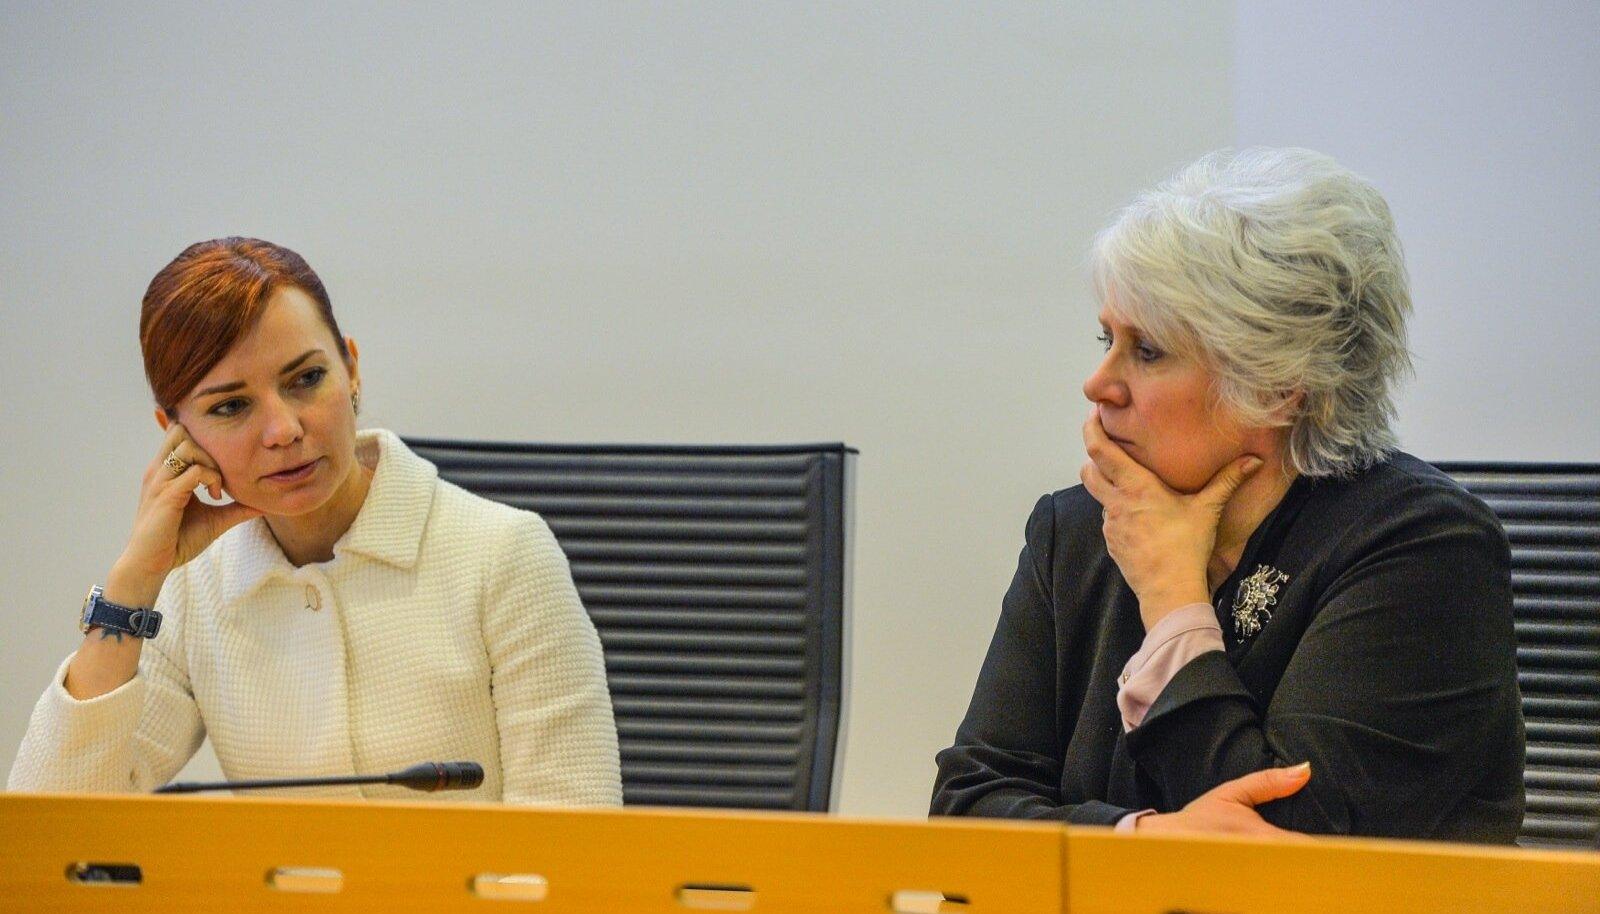 Keit Pentus-Rosimannus ja Marina Kaljurand